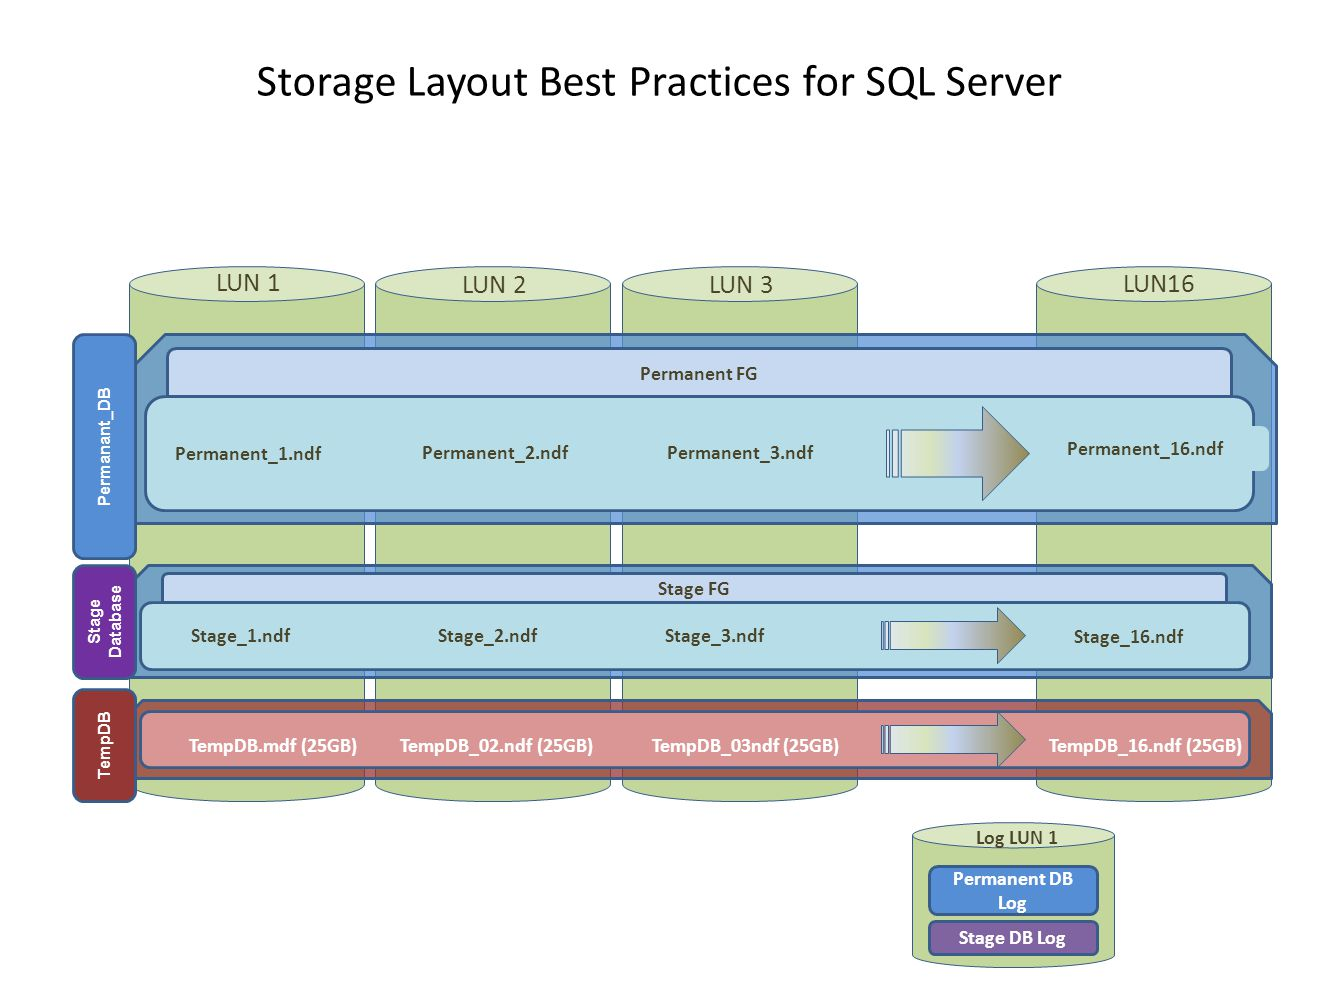 Storage Layout Best Practices for SQL Server LUN16 LUN 2LUN 3 Local Drive 1 Log LUN 1 Permanent DB Log LUN 1 TempDB TempDB.mdf (25GB)TempDB_02.ndf (25